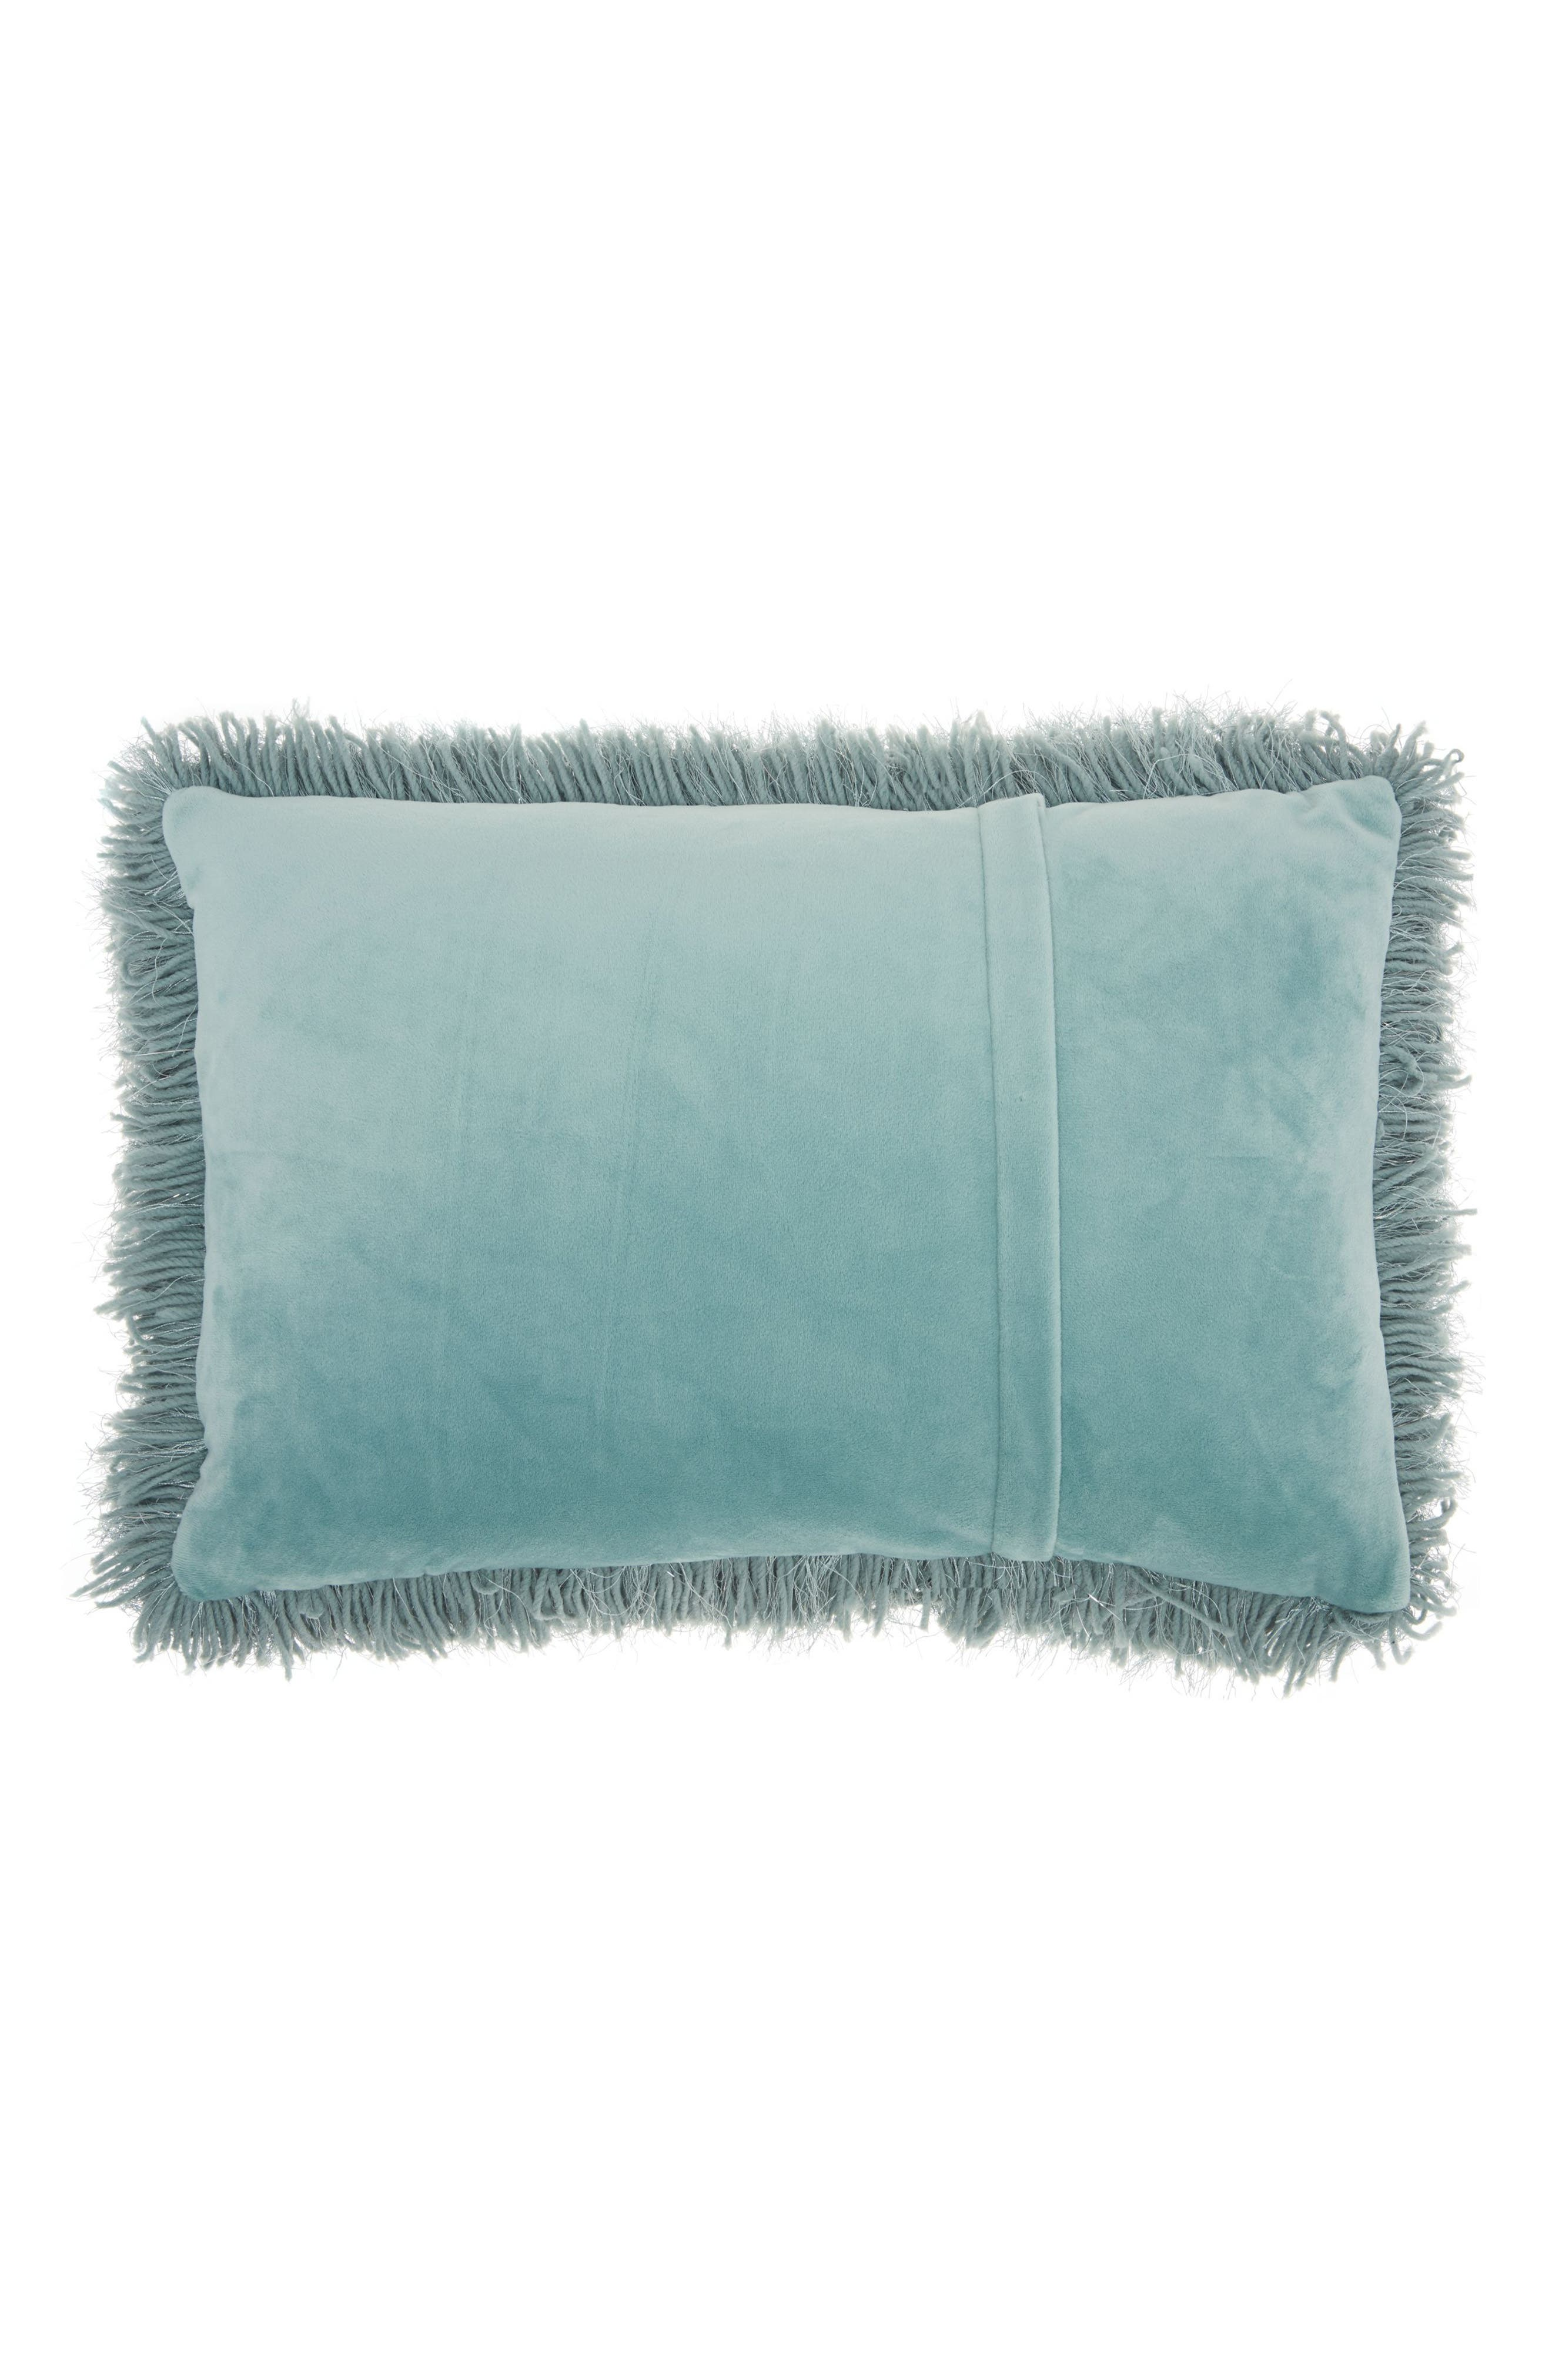 Yarn Shimmer Shag Pillow,                             Alternate thumbnail 2, color,                             400